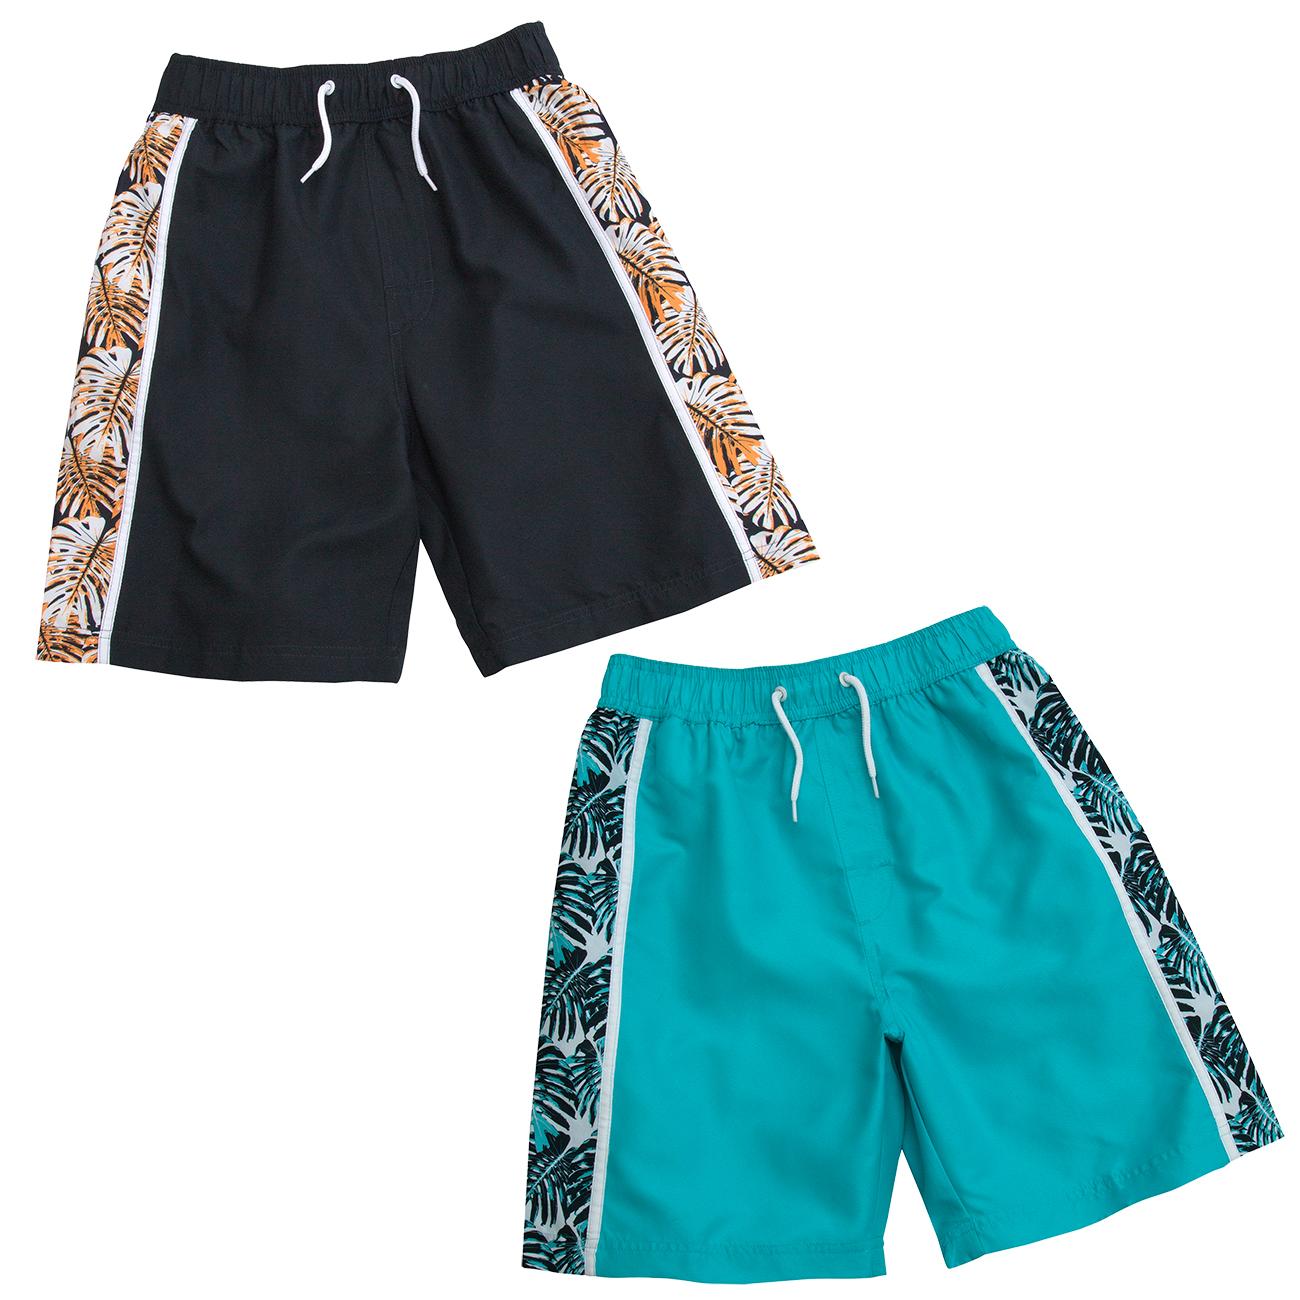 4c93bb8462e9 Infant Boys Bermuda Swim Swimming Shorts Trunks Swimwear Summer Holidays  Beach